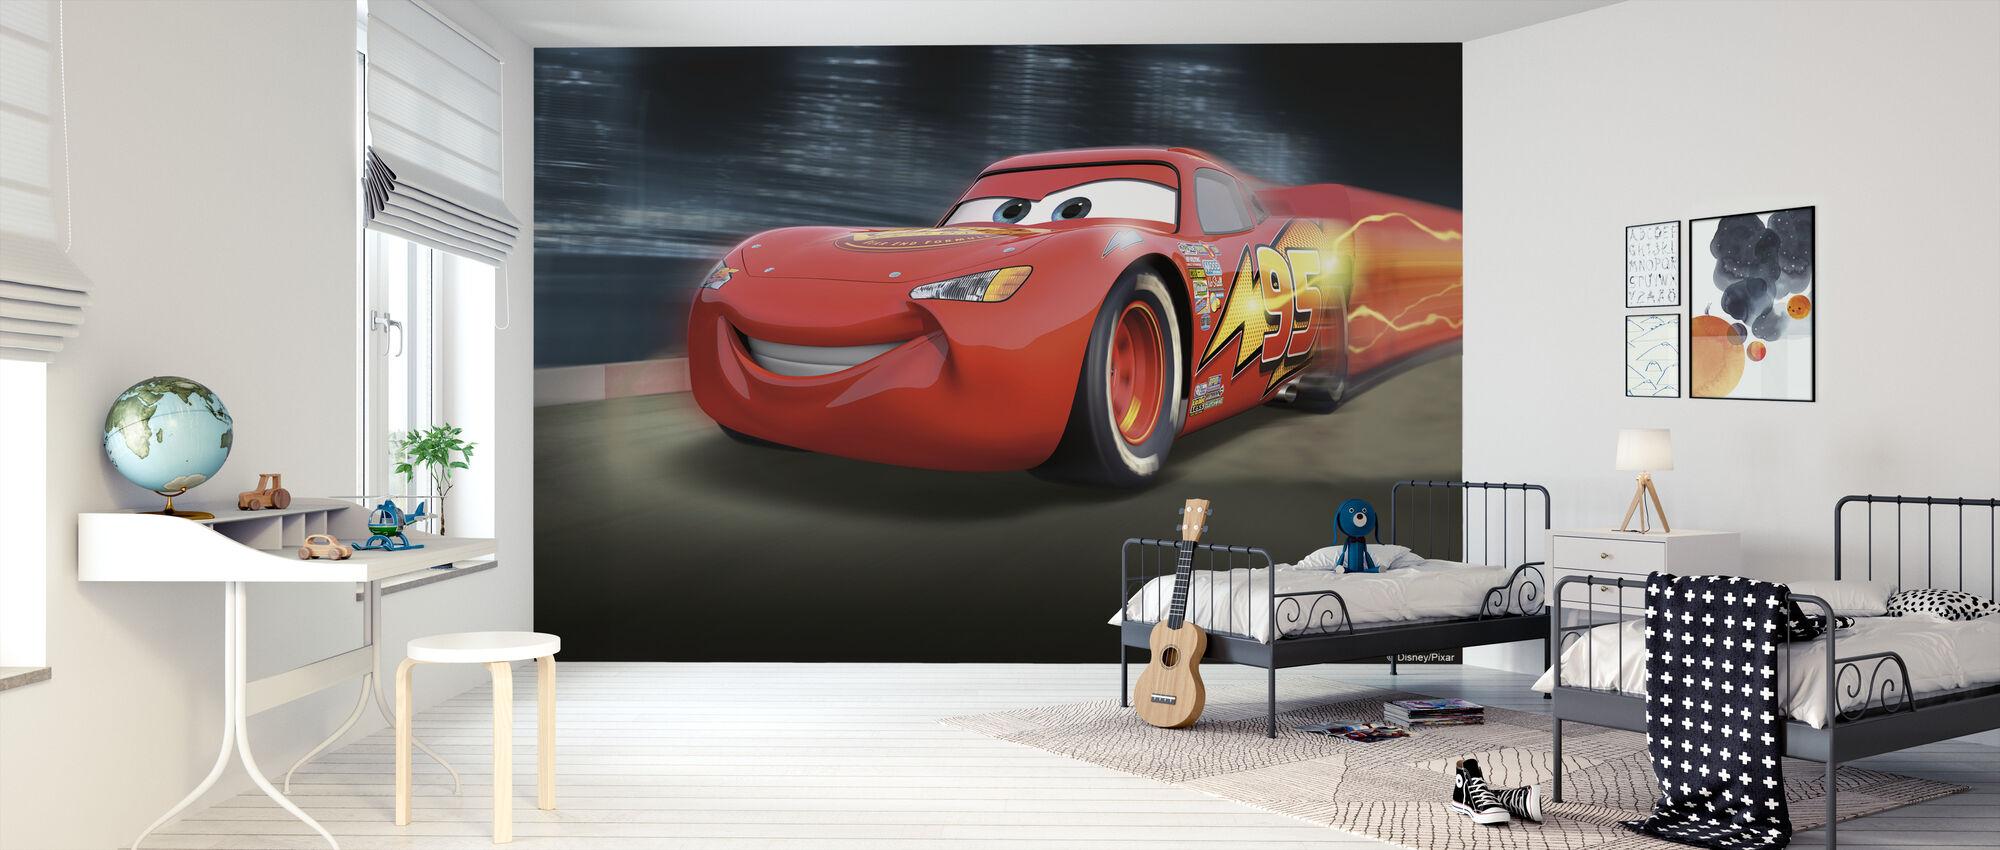 Biler - Racerbane McQueen - Tapet - Børneværelse